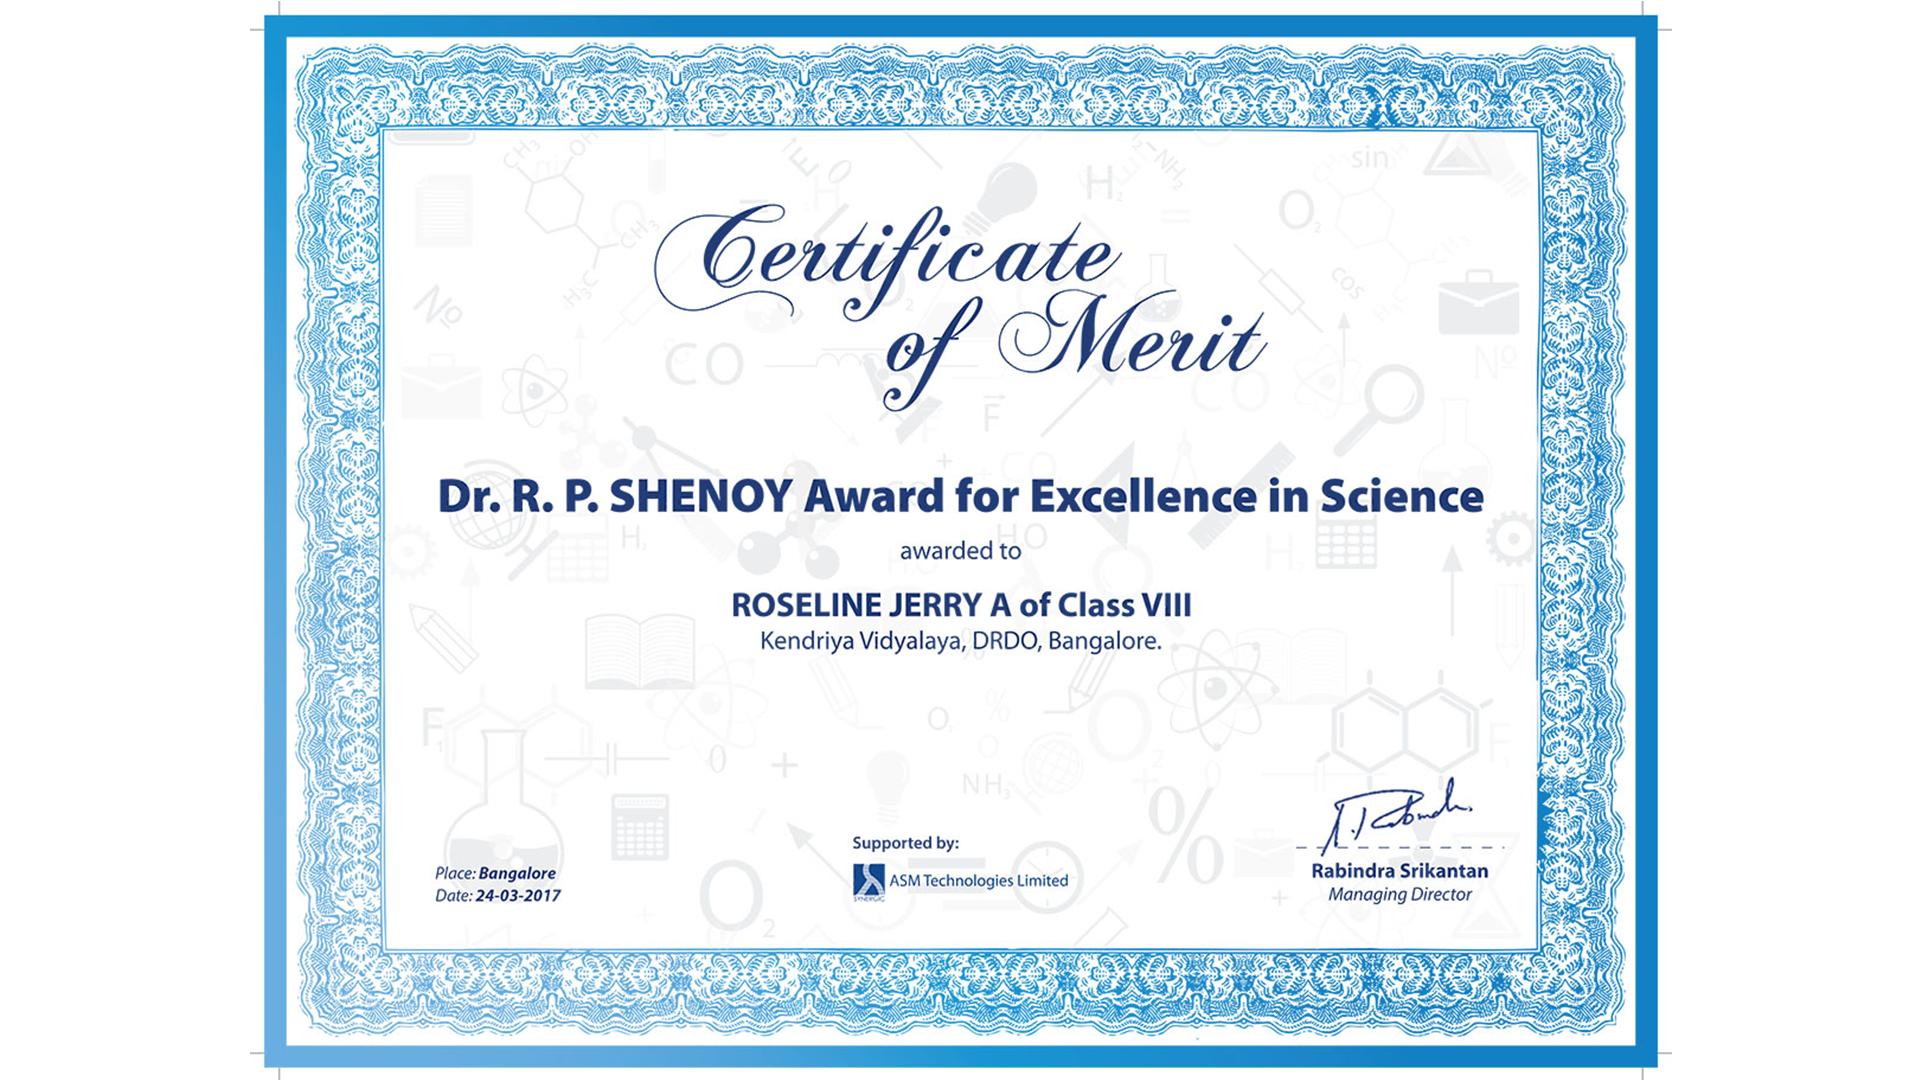 shenoy award